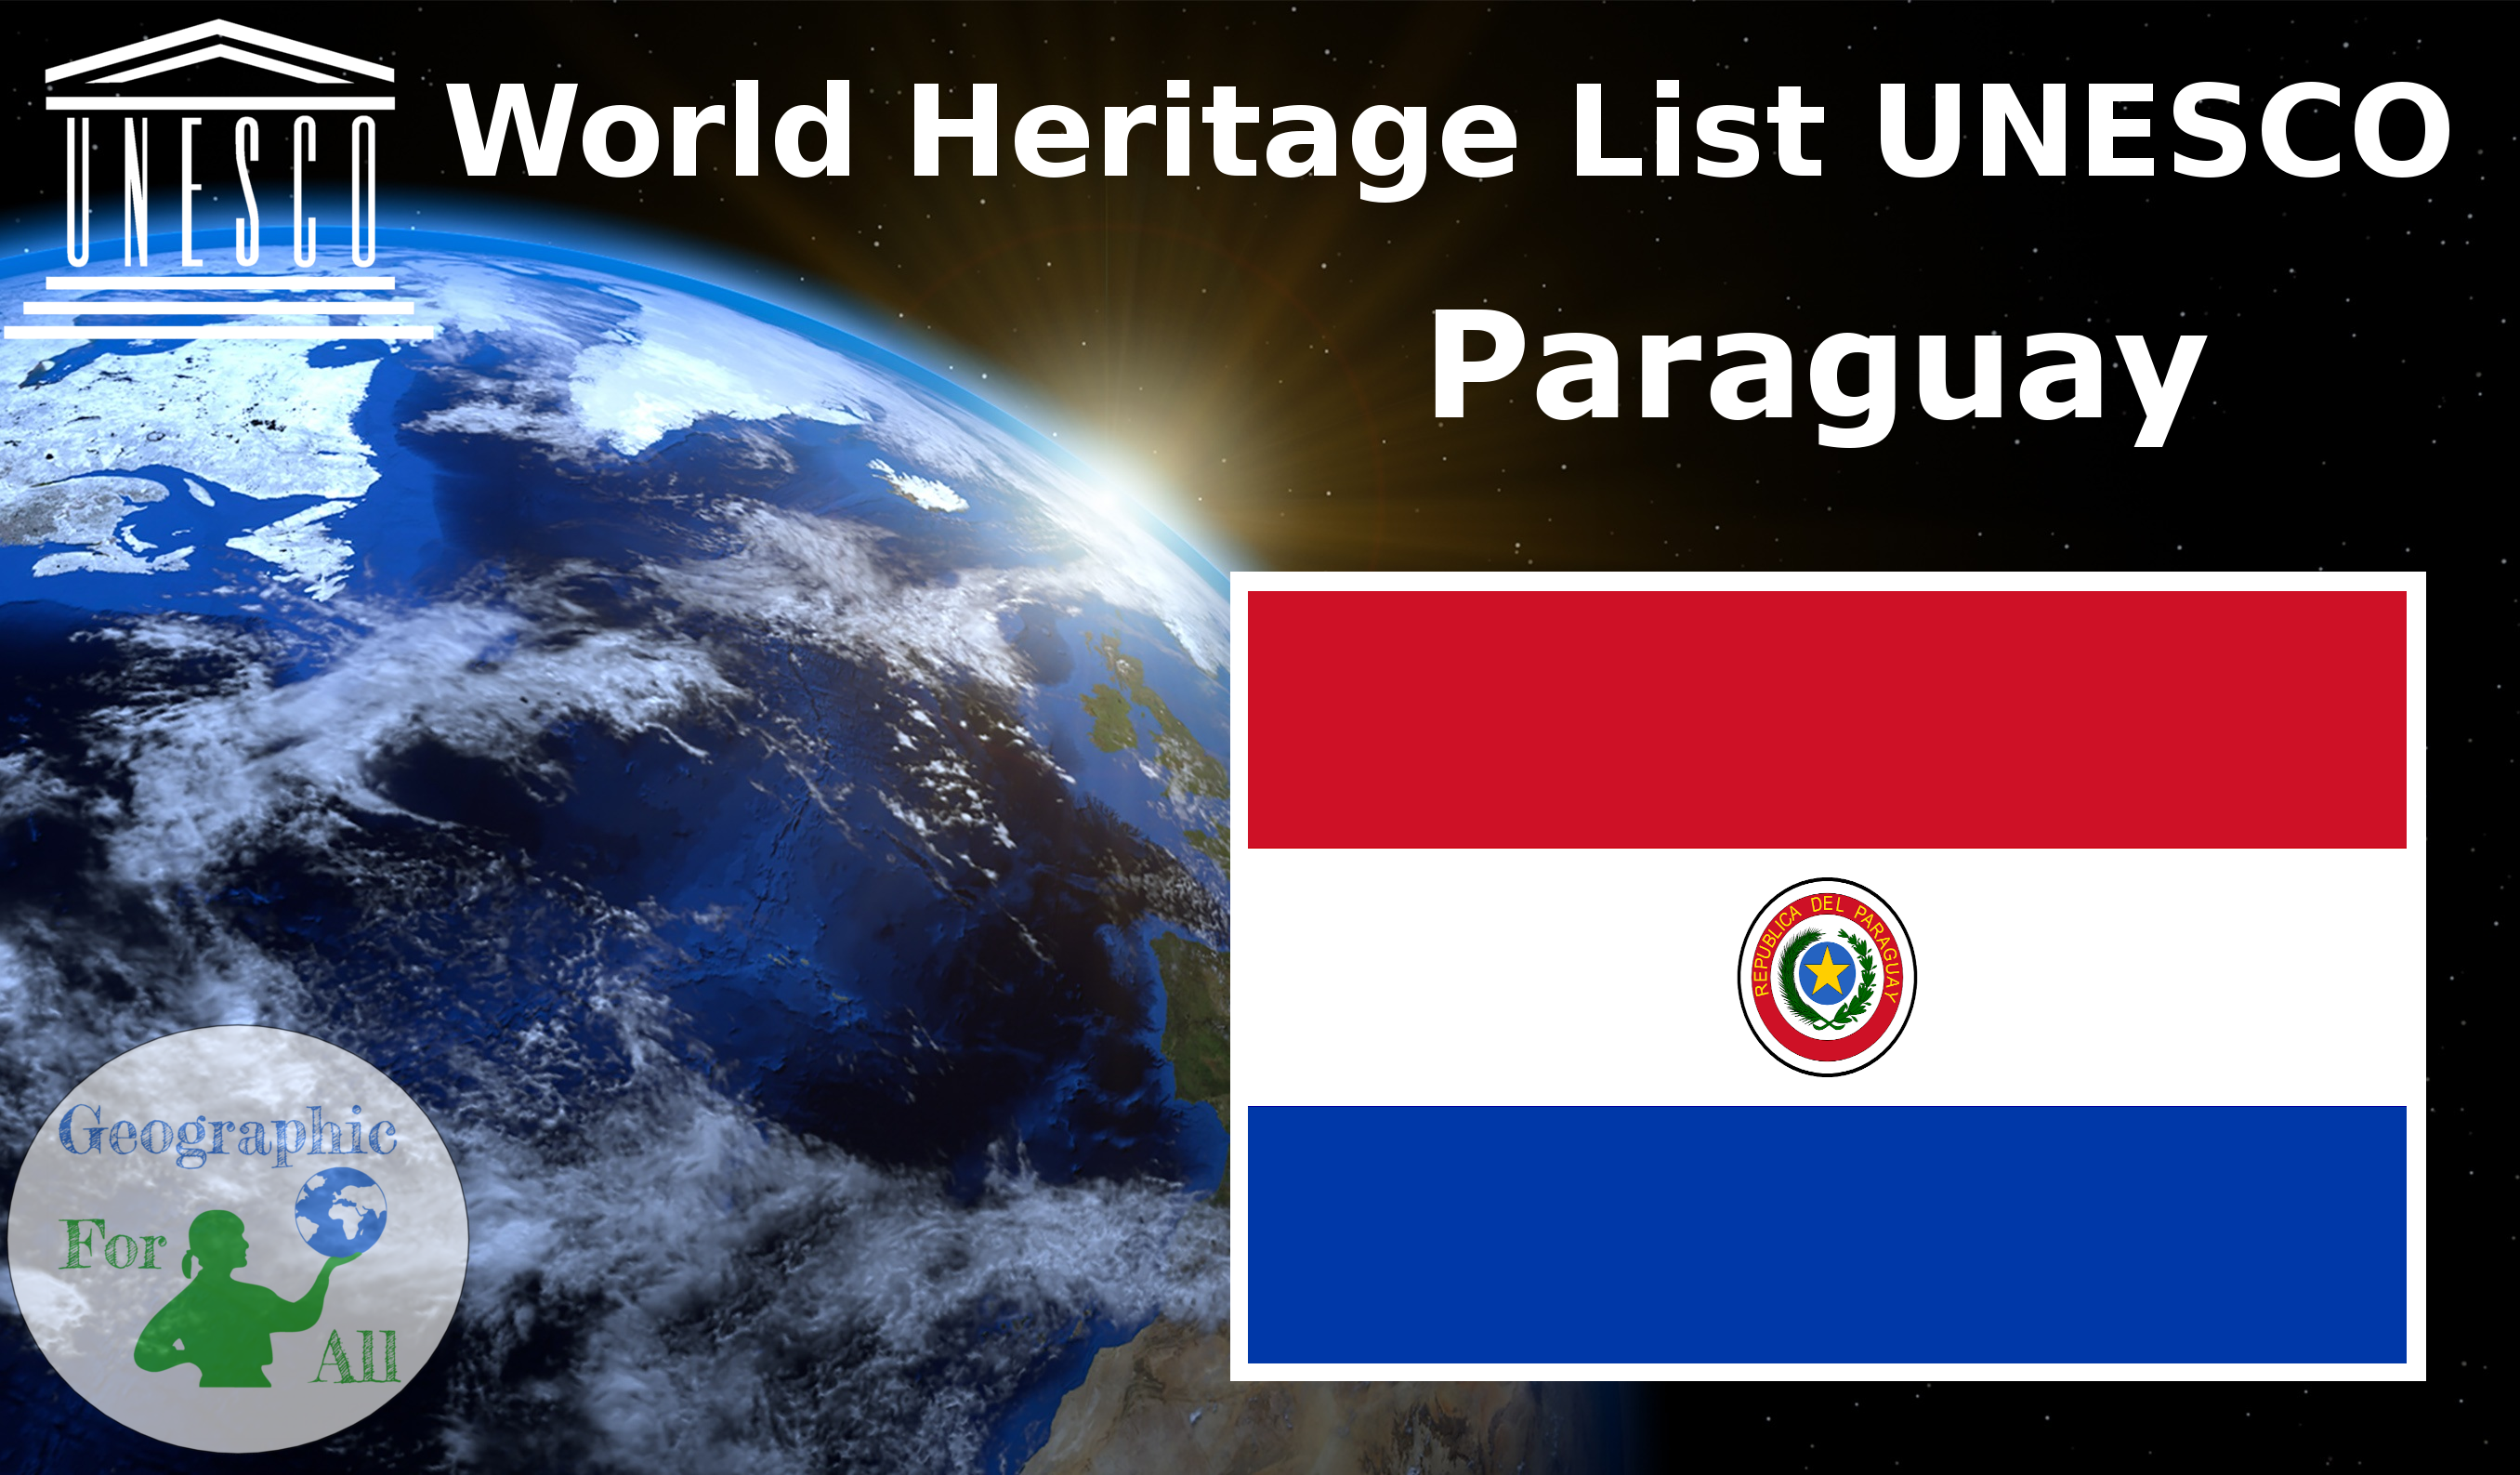 World Heritage List UNESCO - Paraguay